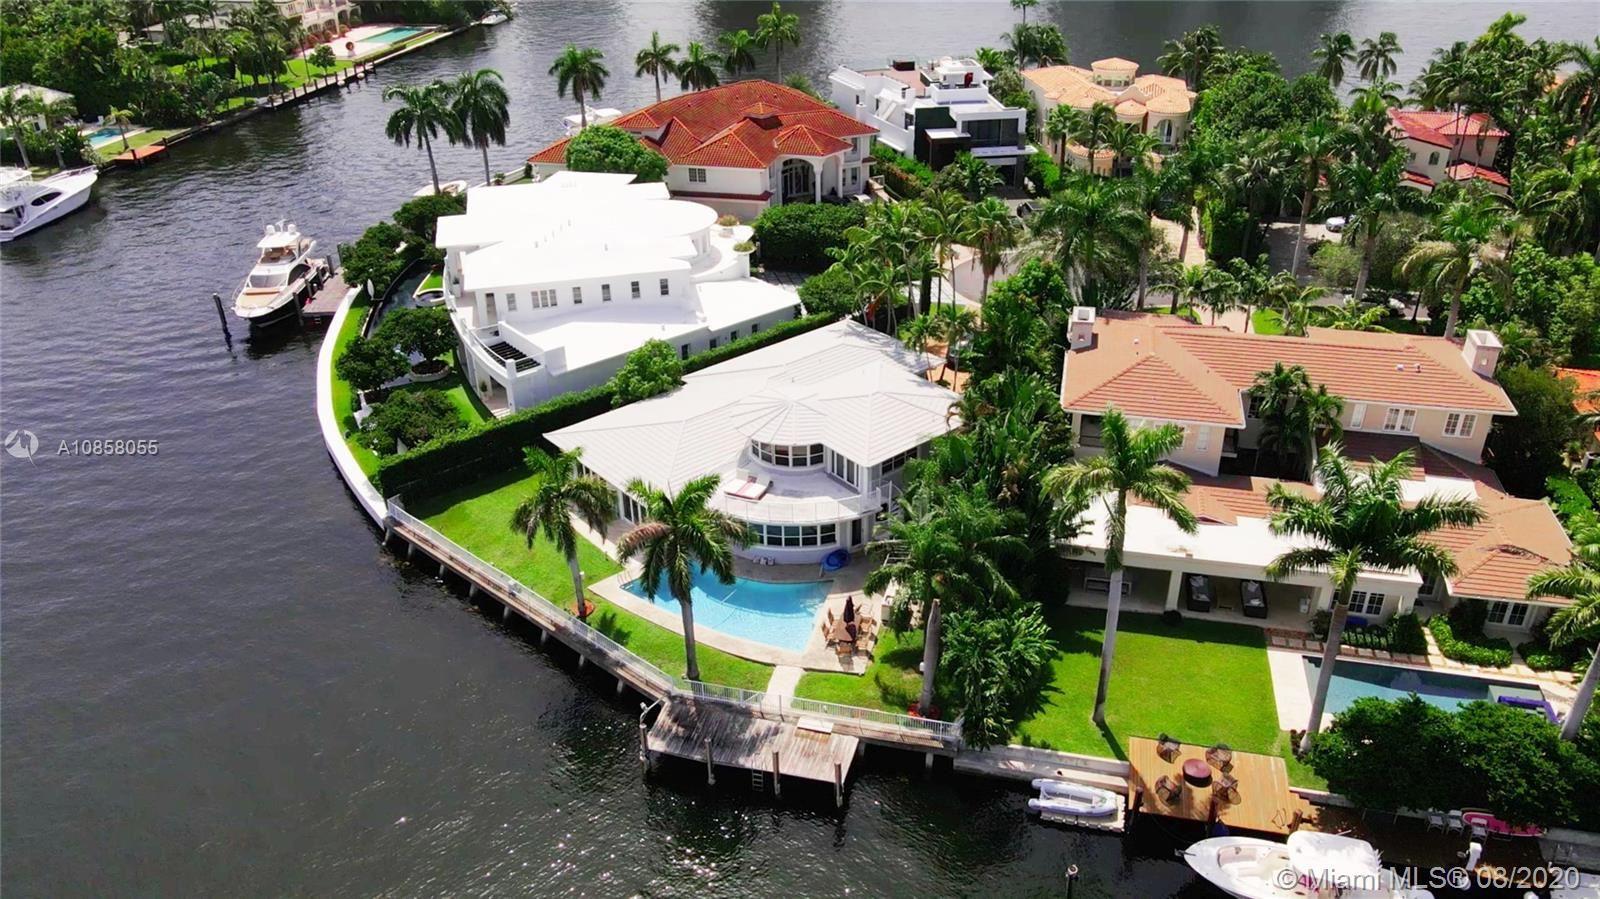 Photo of 138 S Island Is, Golden Beach, FL 33160 (MLS # A10858055)